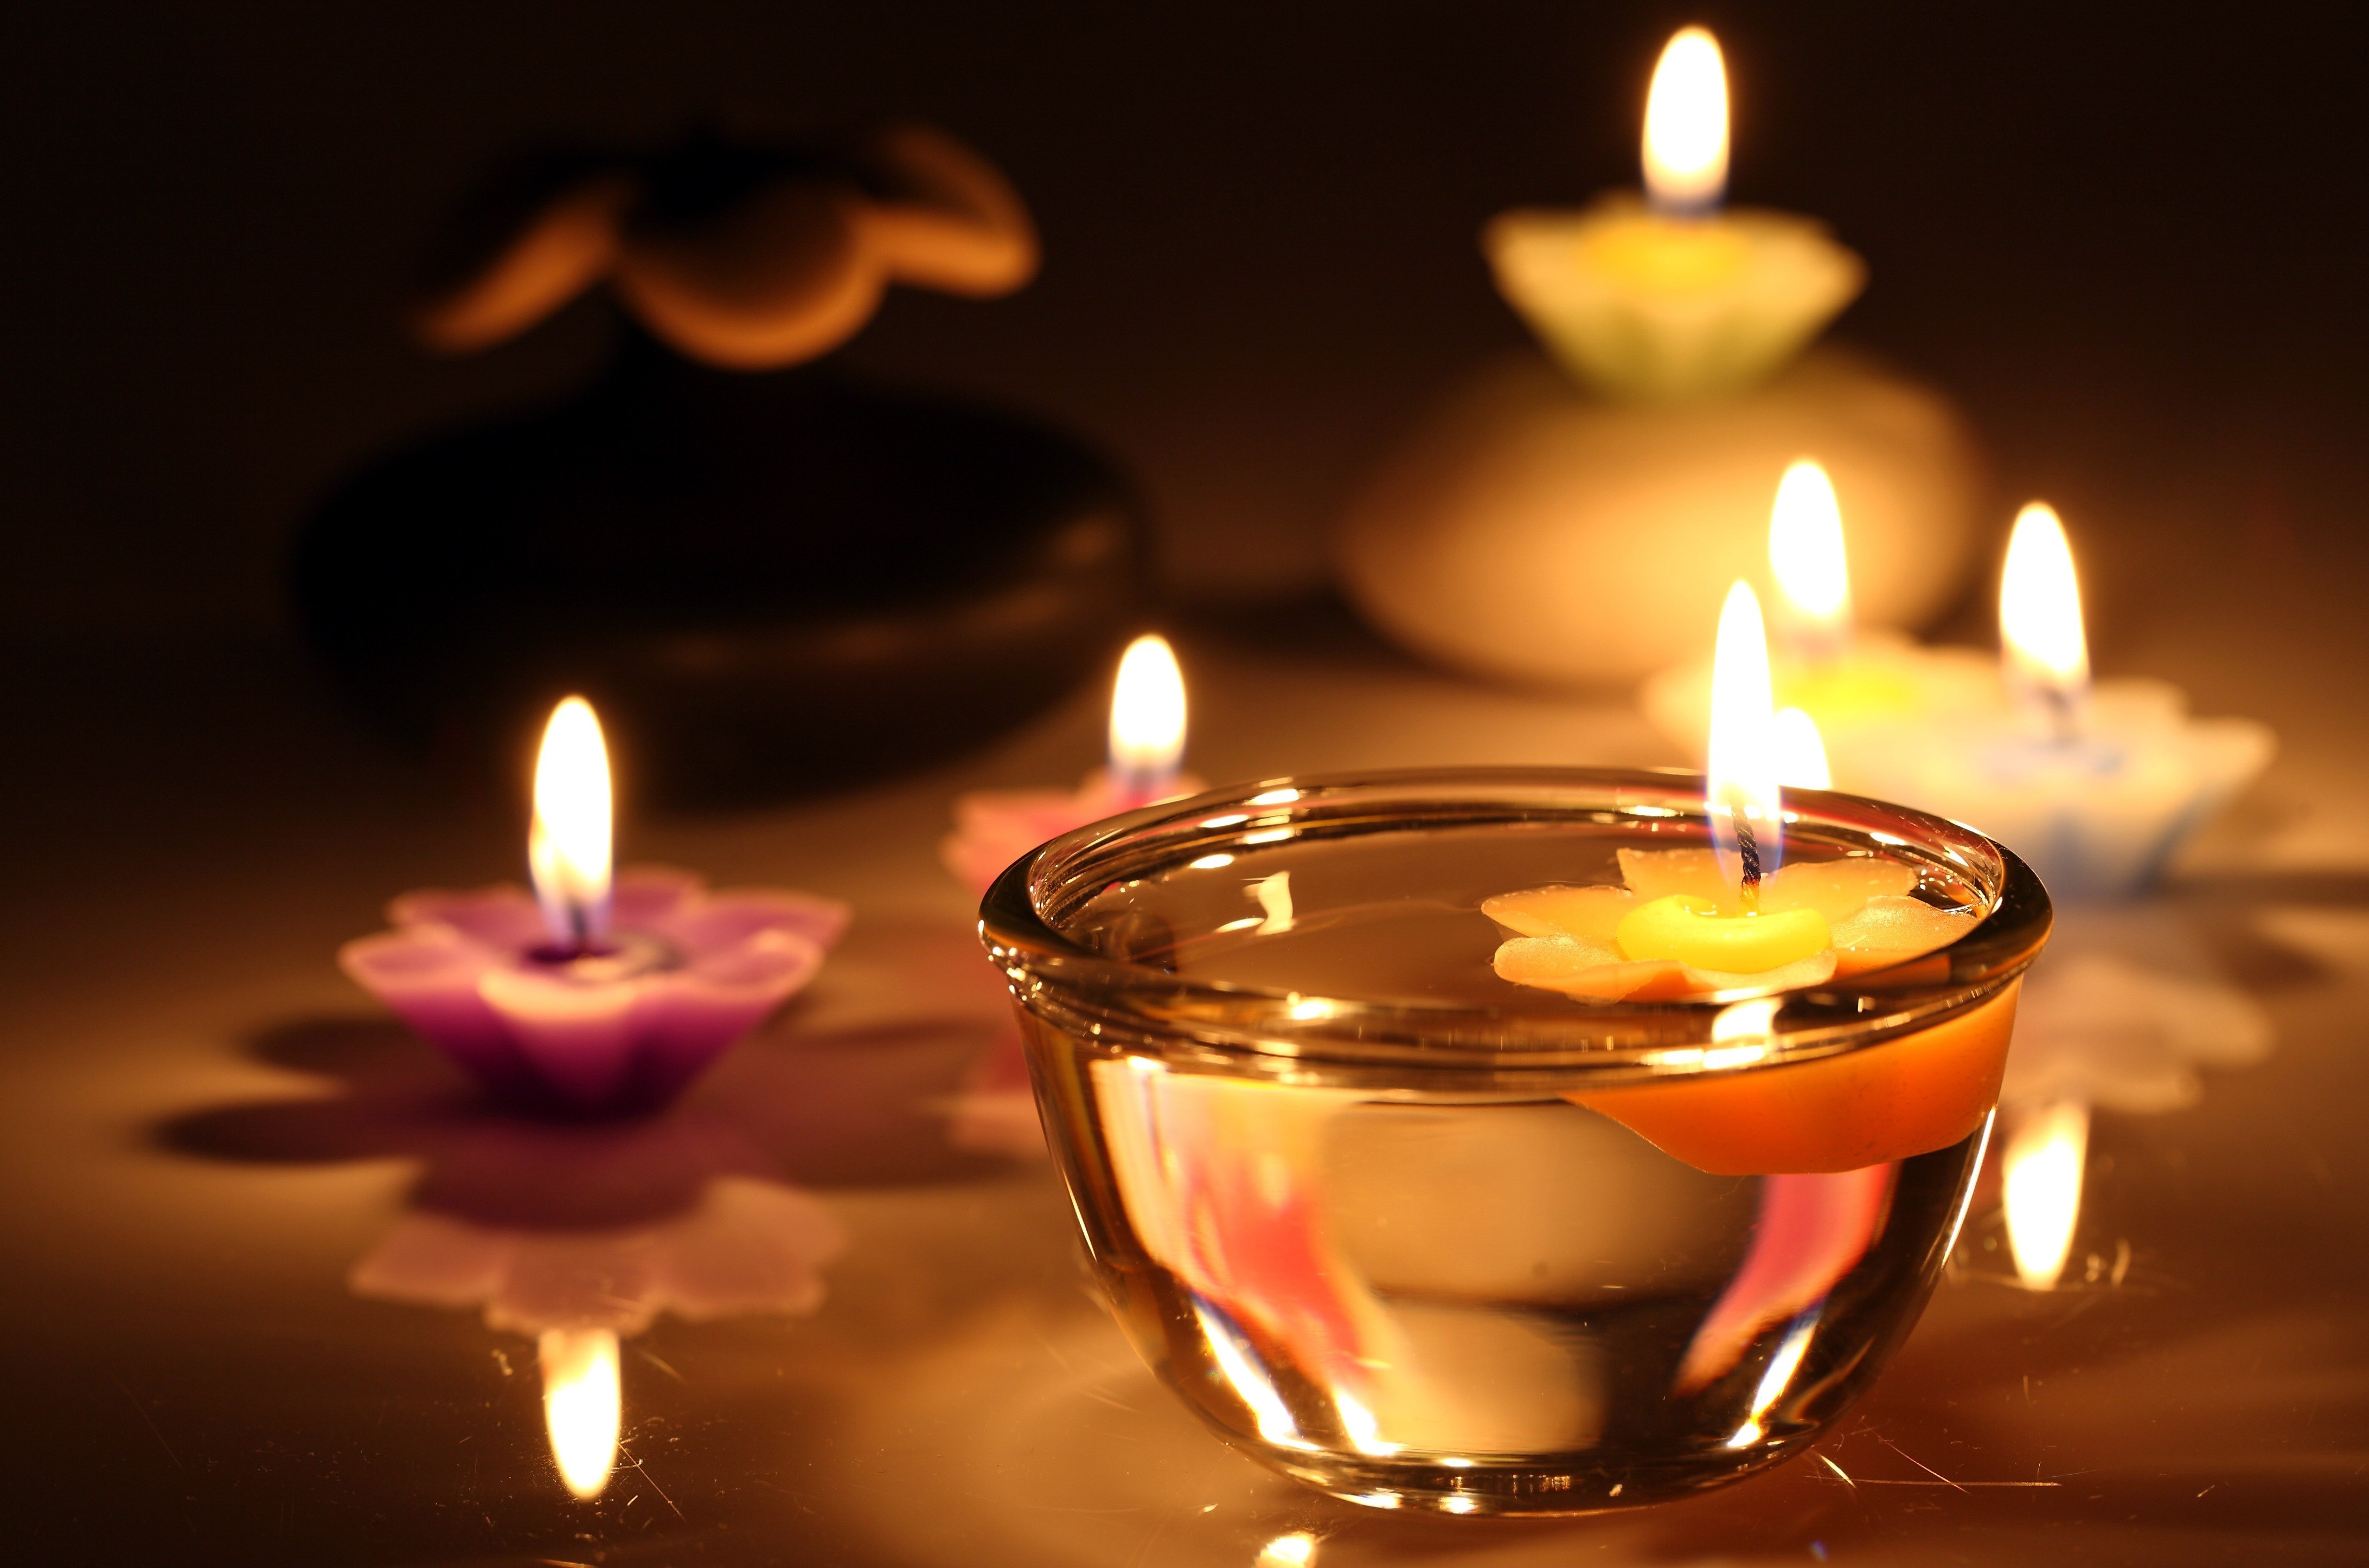 candle wallpaper 34 4368x2892. Black Bedroom Furniture Sets. Home Design Ideas